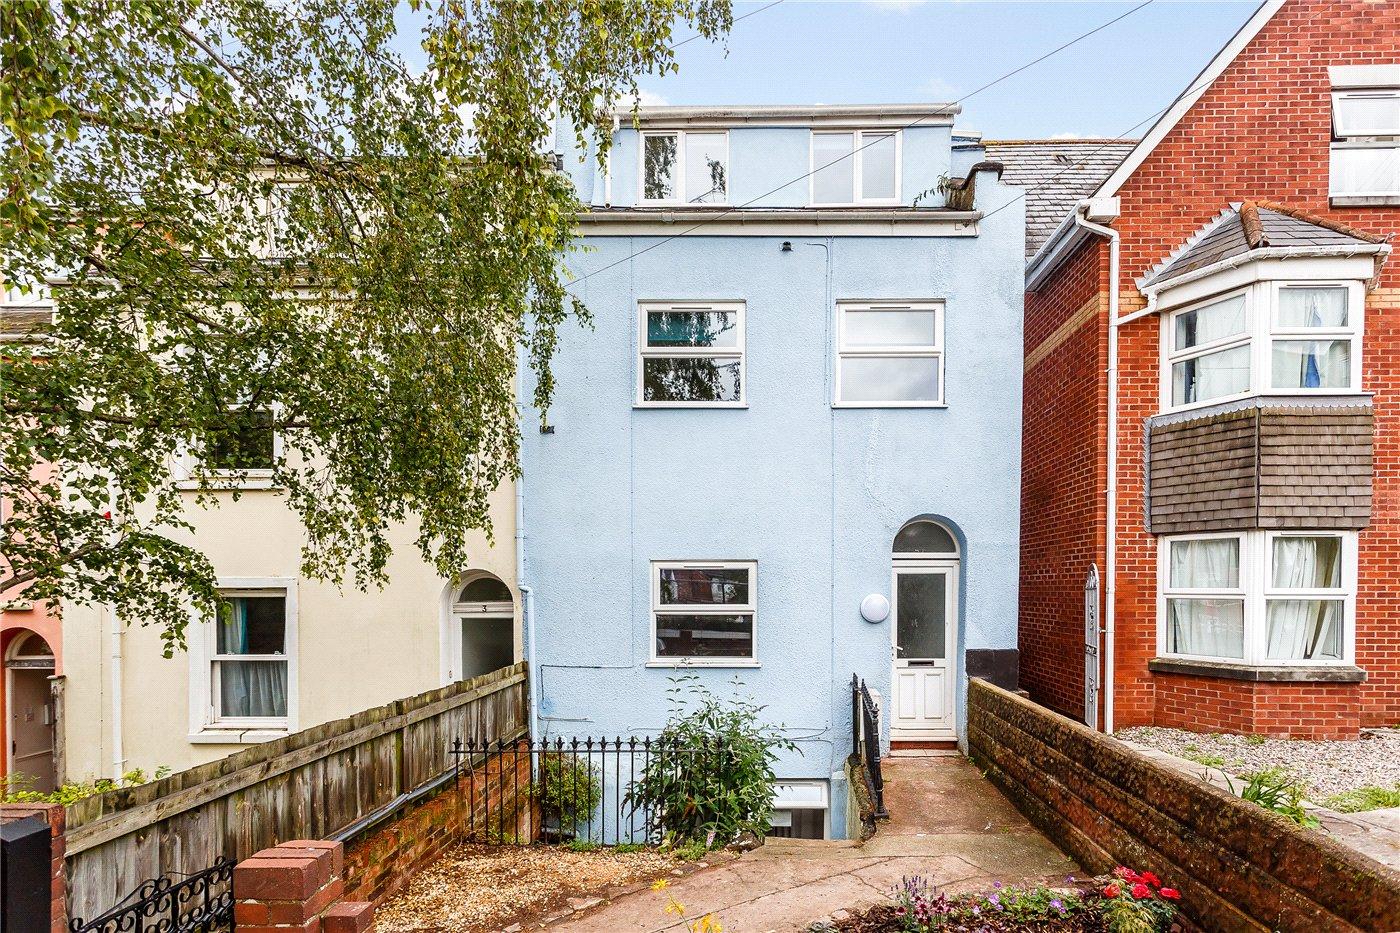 6 bedroom property to rent in york terrace exeter devon for Terrace exeter